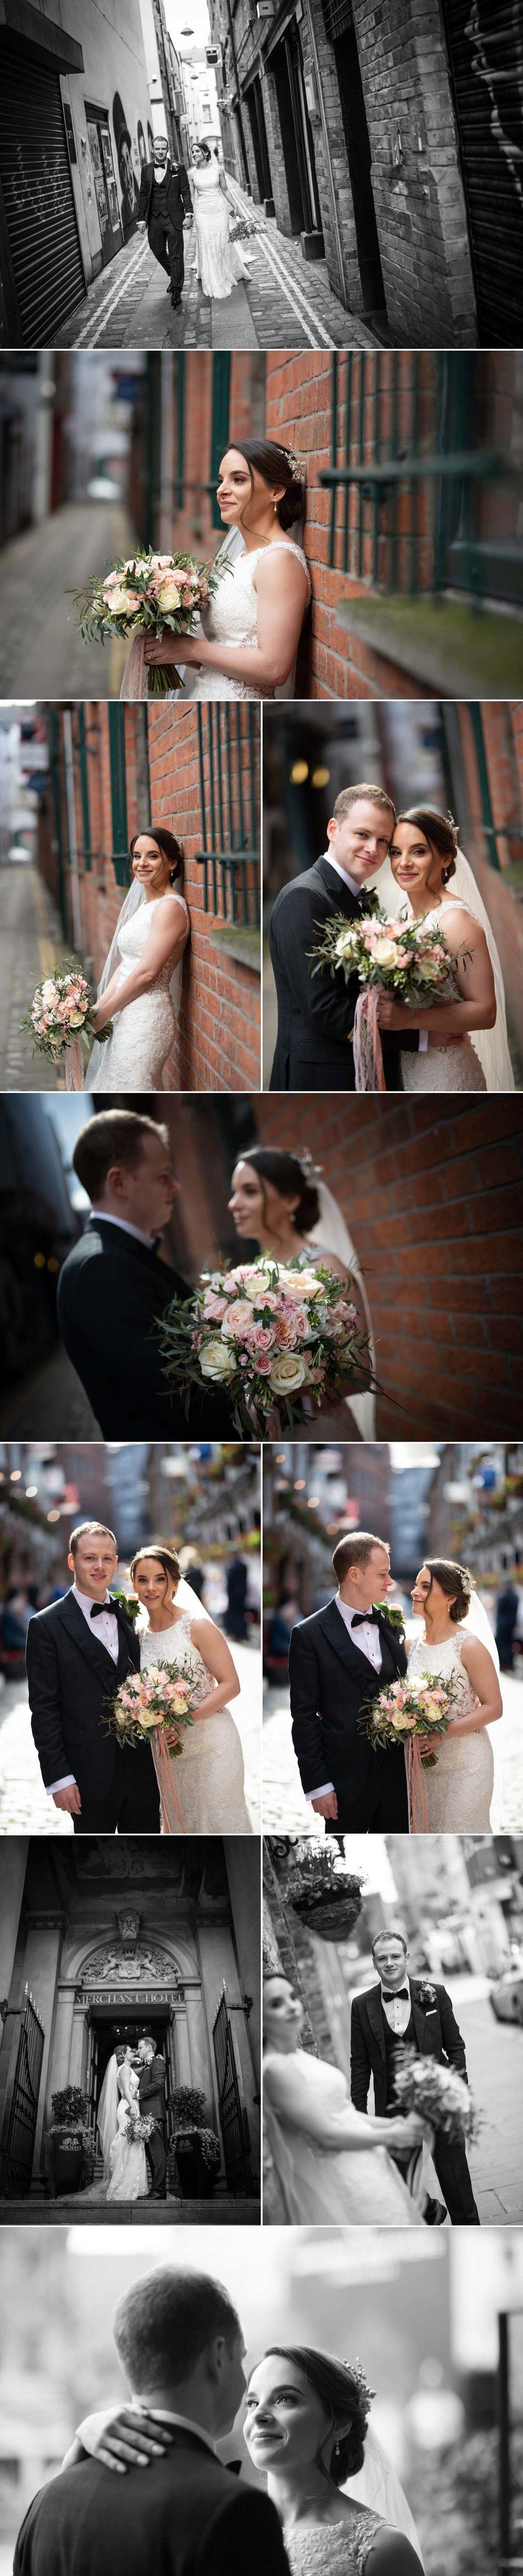 Merchant Hotel Belfast Wedding Photography James McGrillis 16.jpg